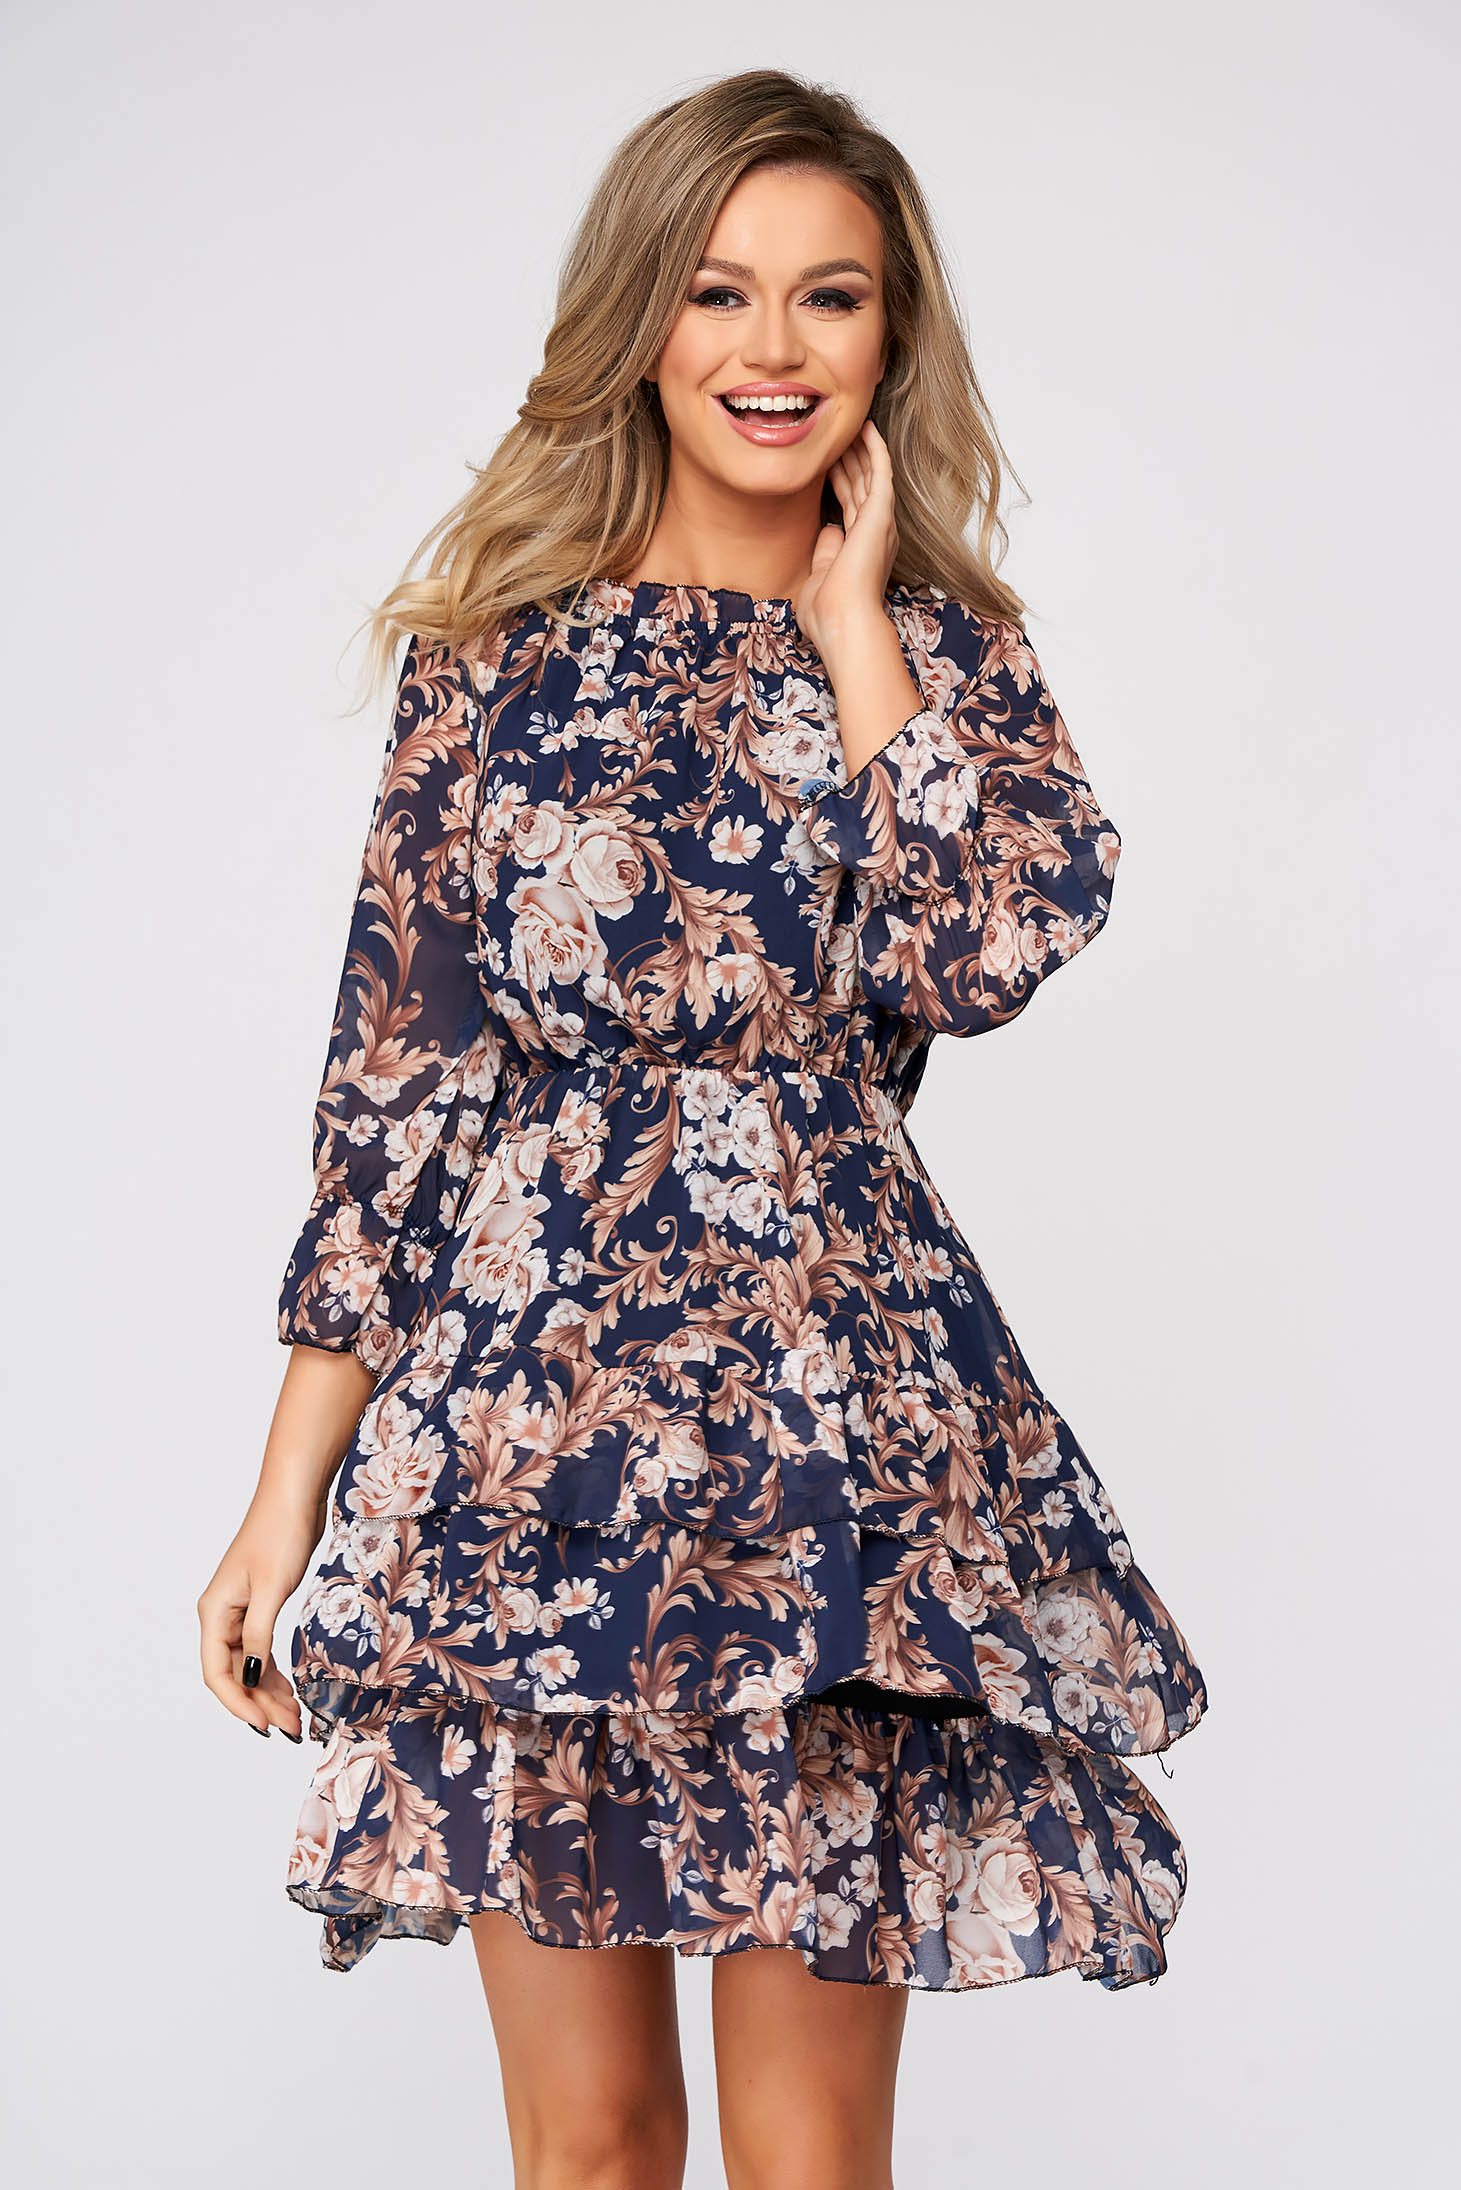 Darkblue dress short cut daily thin fabric off-shoulder